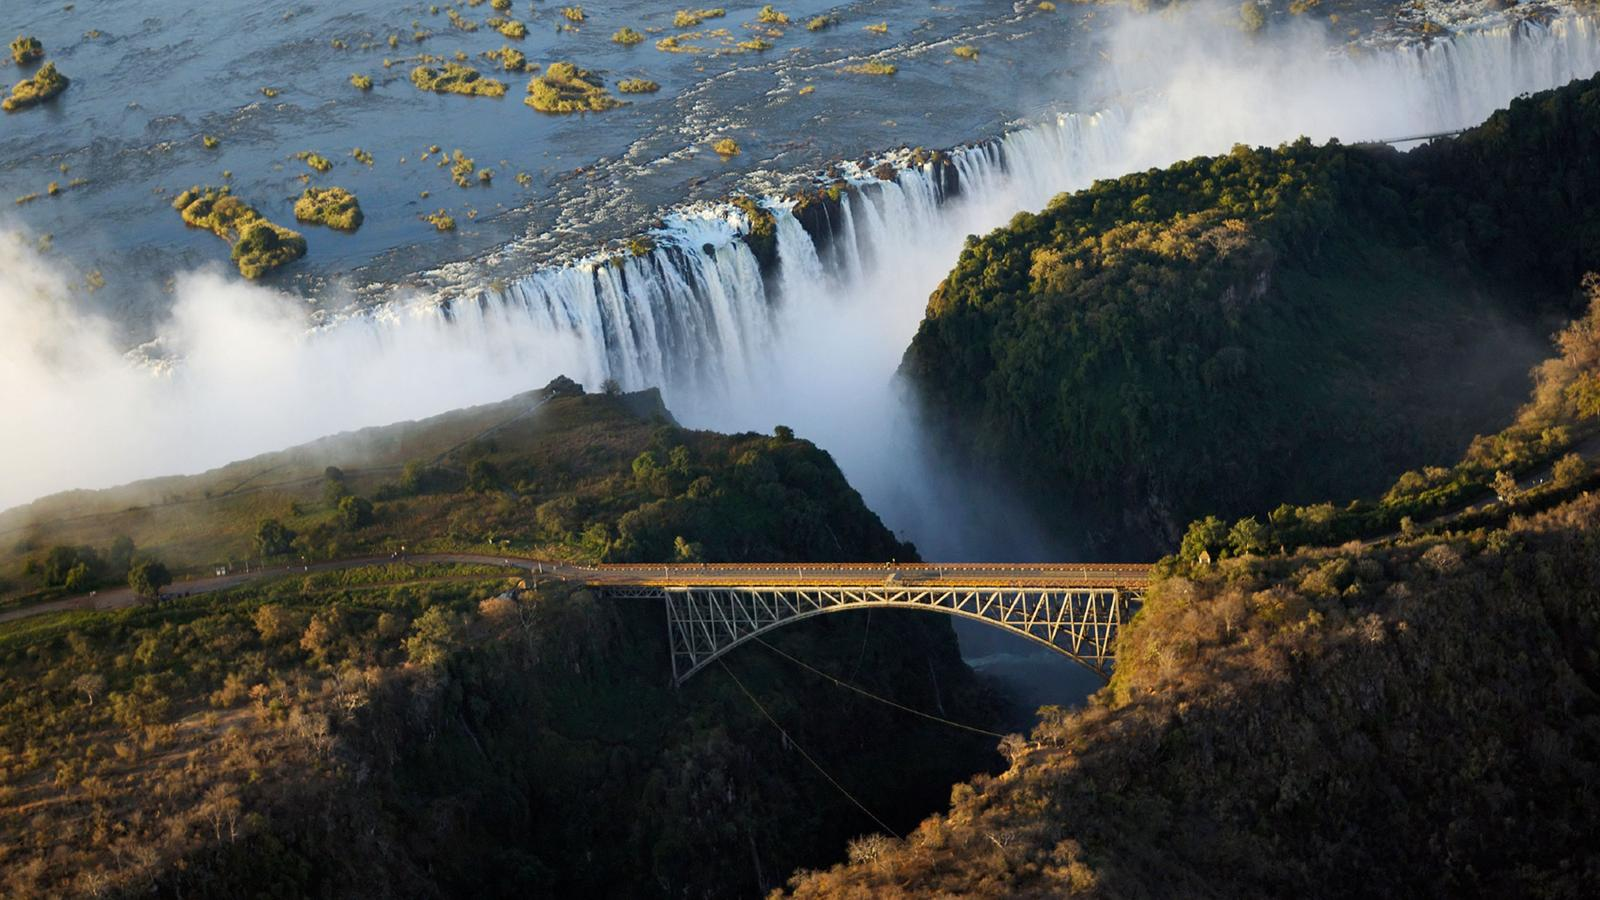 Victoria Falls Wallpaper Delta Amp Falls Discoverer In Botswana Africa G Adventures